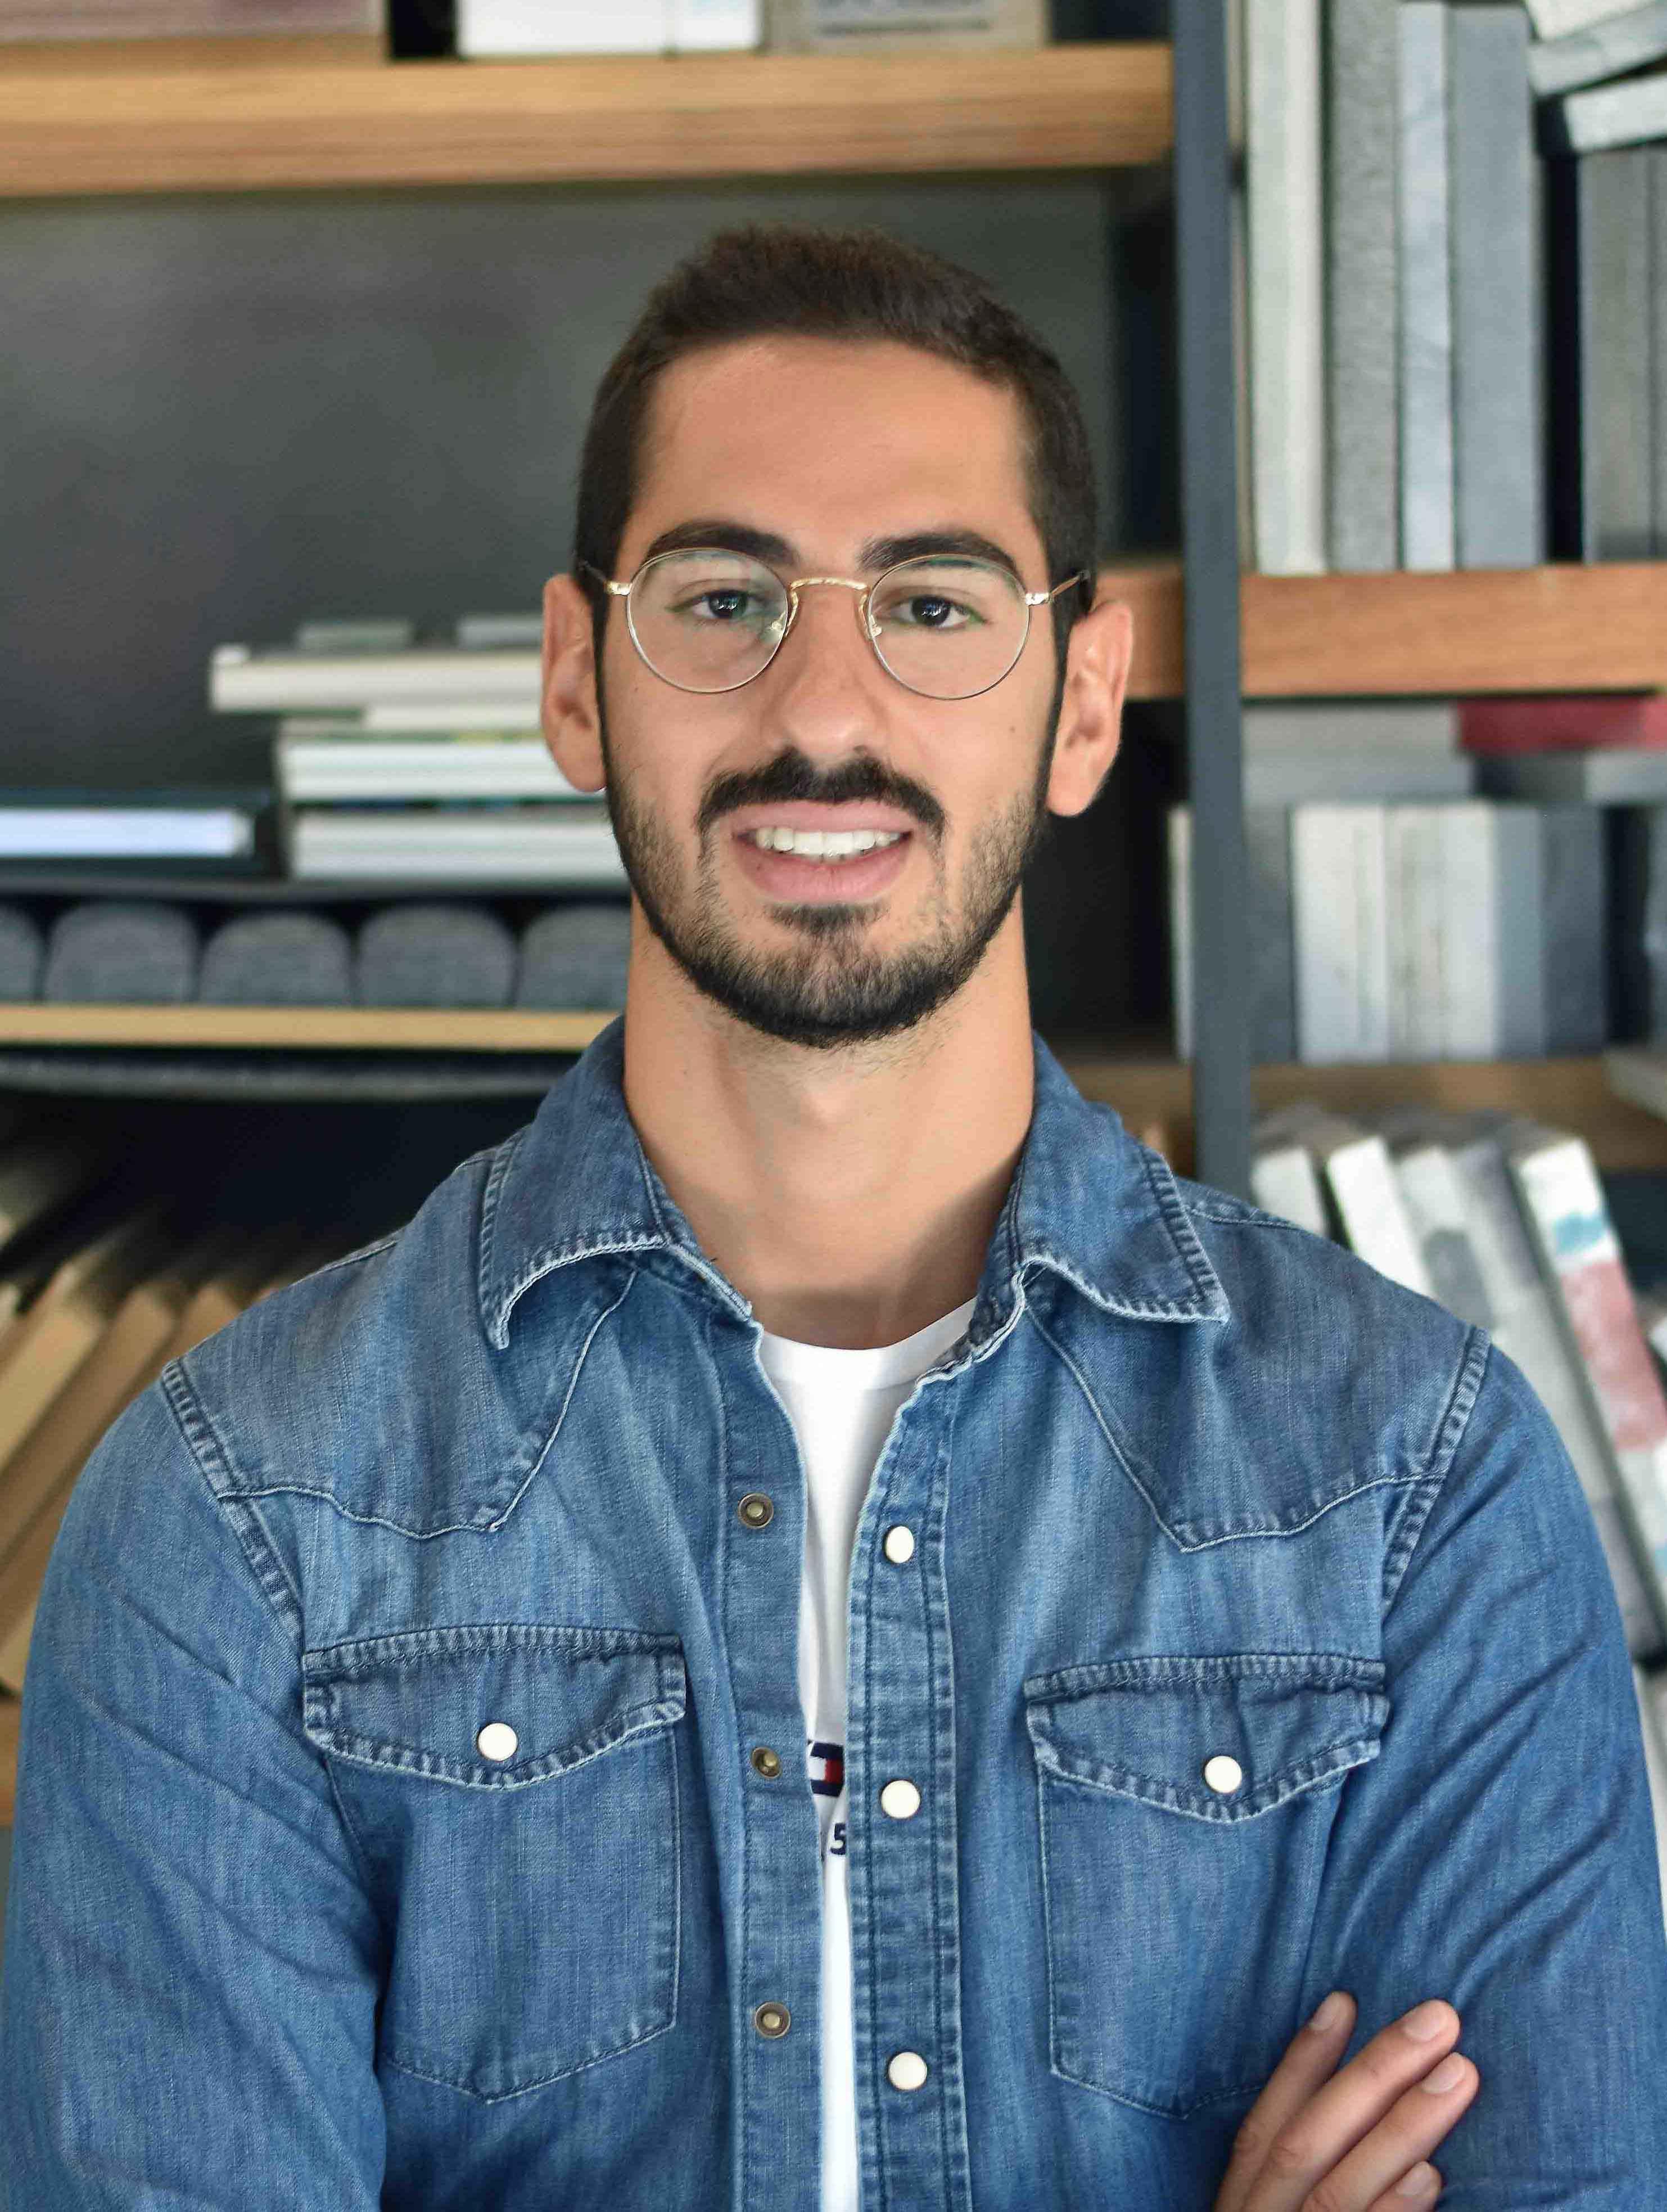 Joey Aoun